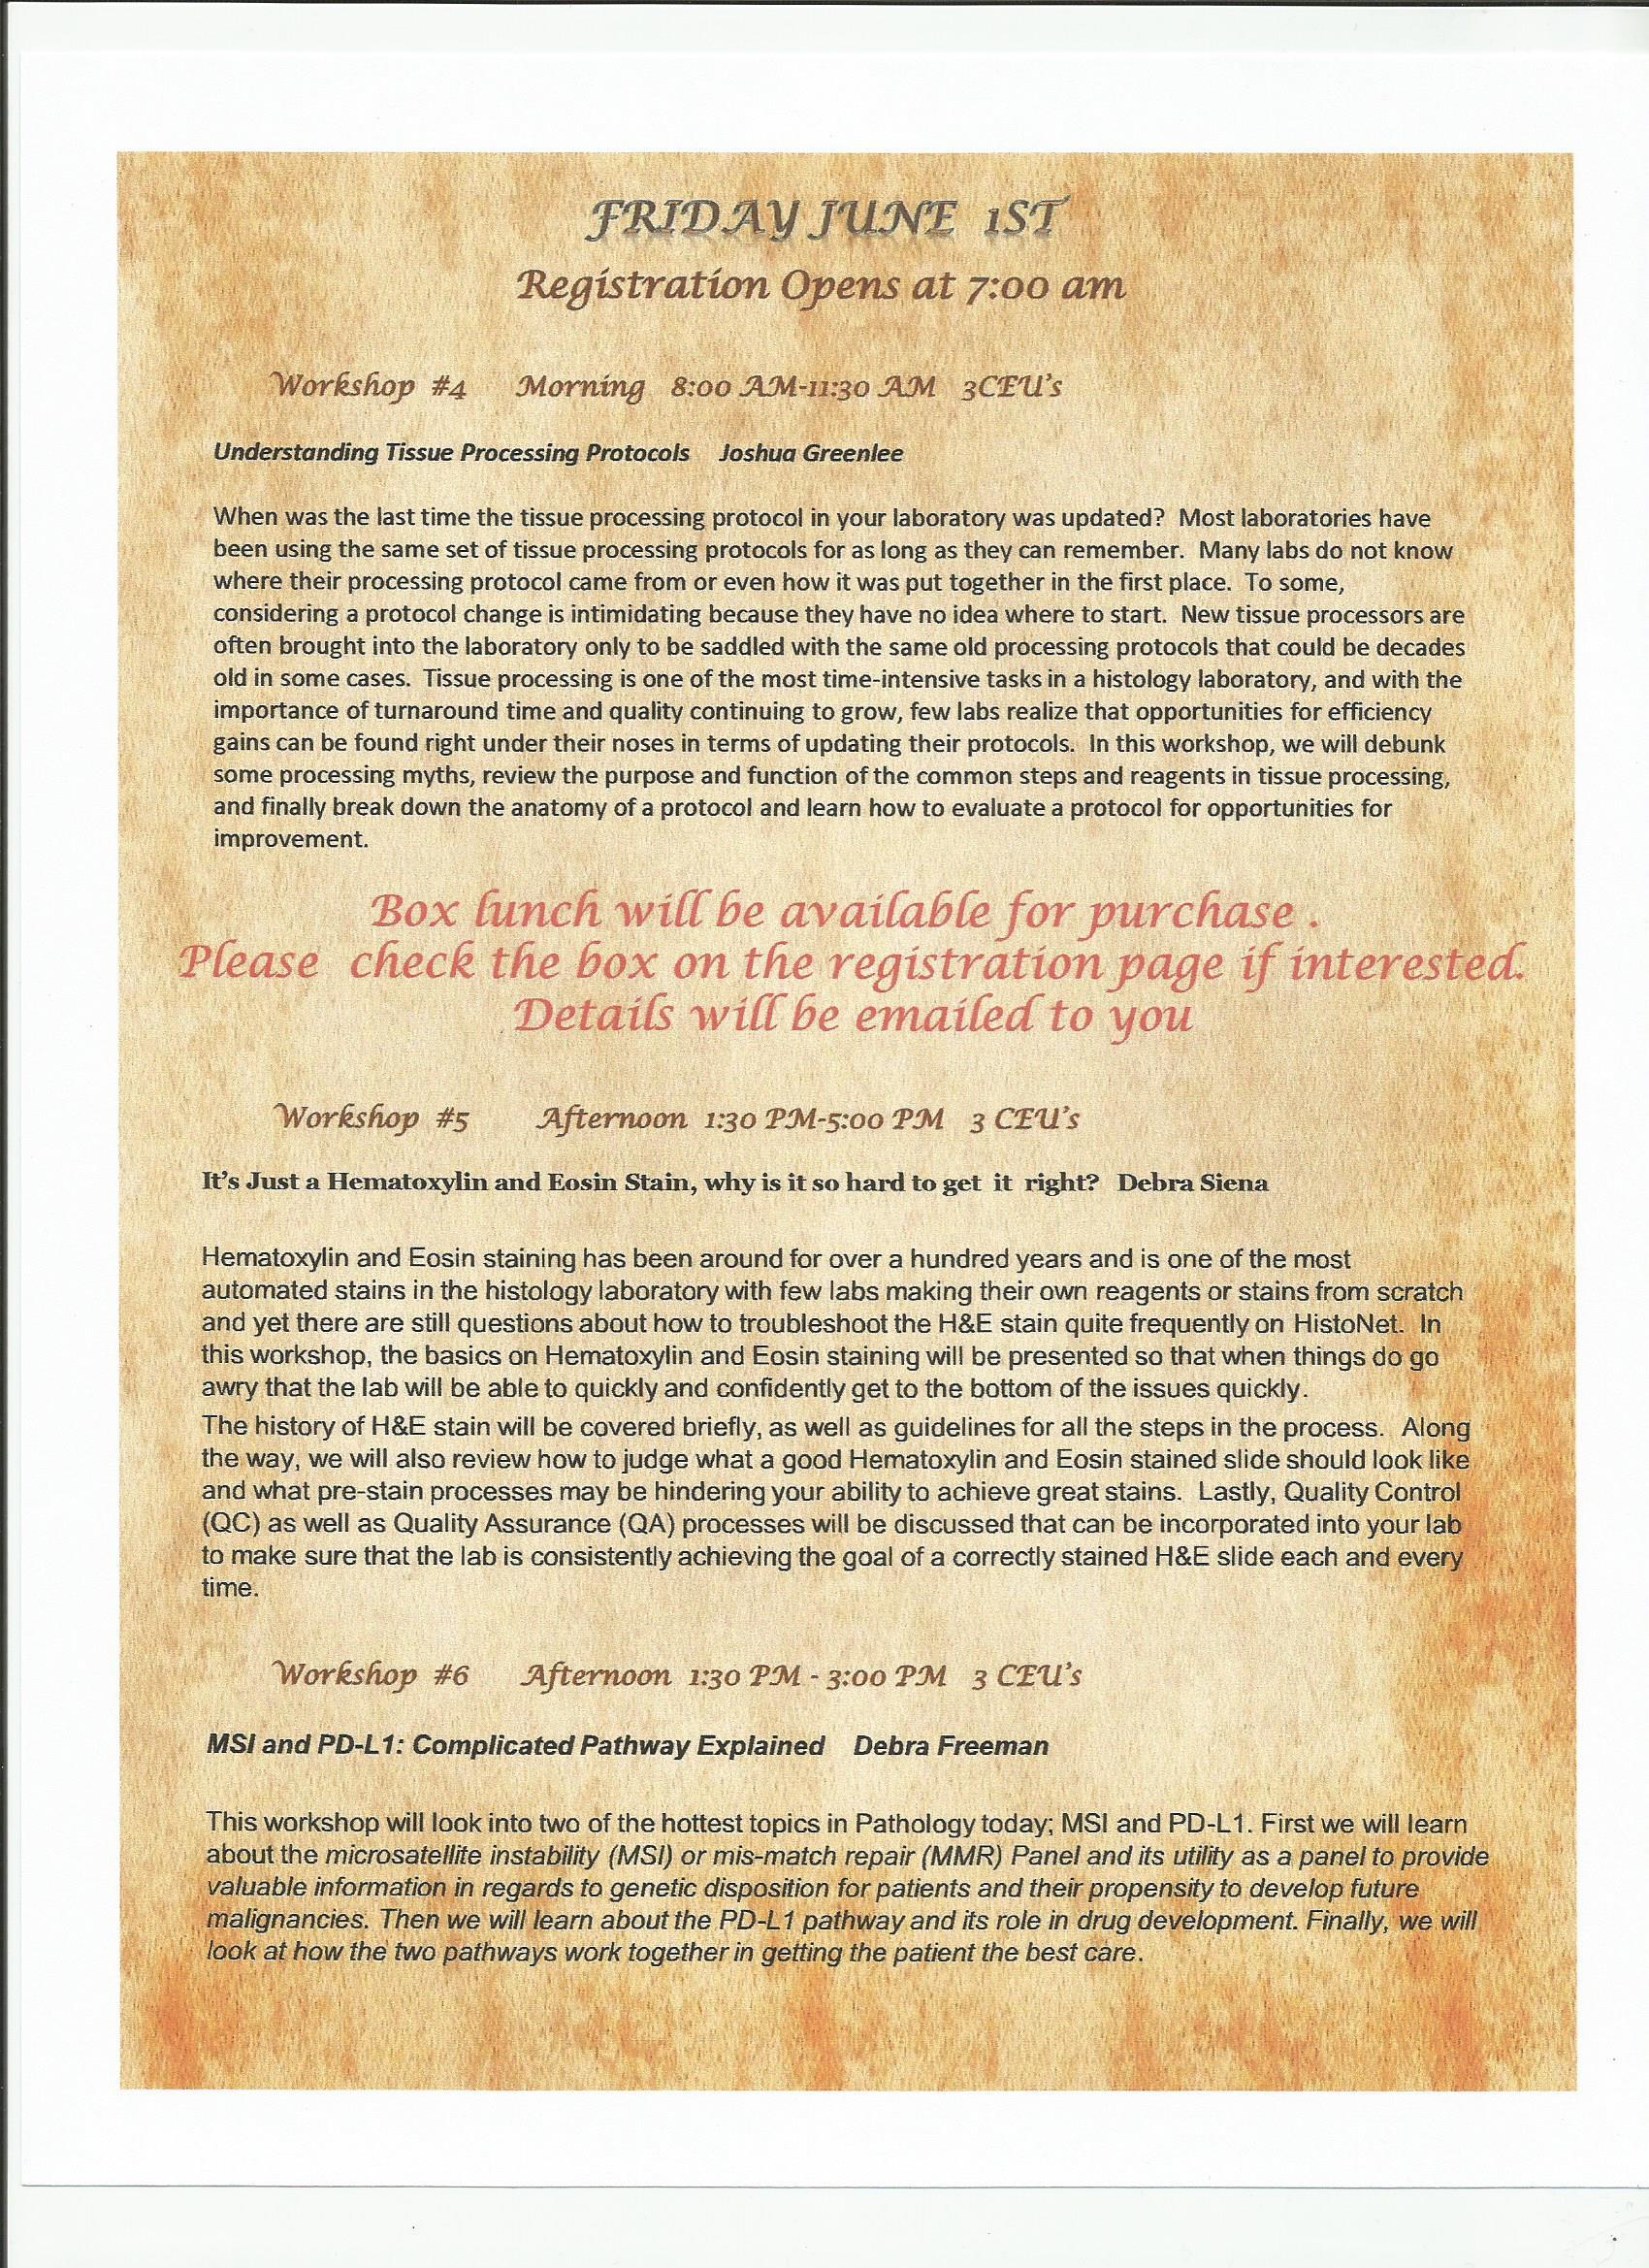 ASH 2018 Summer Symposium Brochure Pics0003.jpg